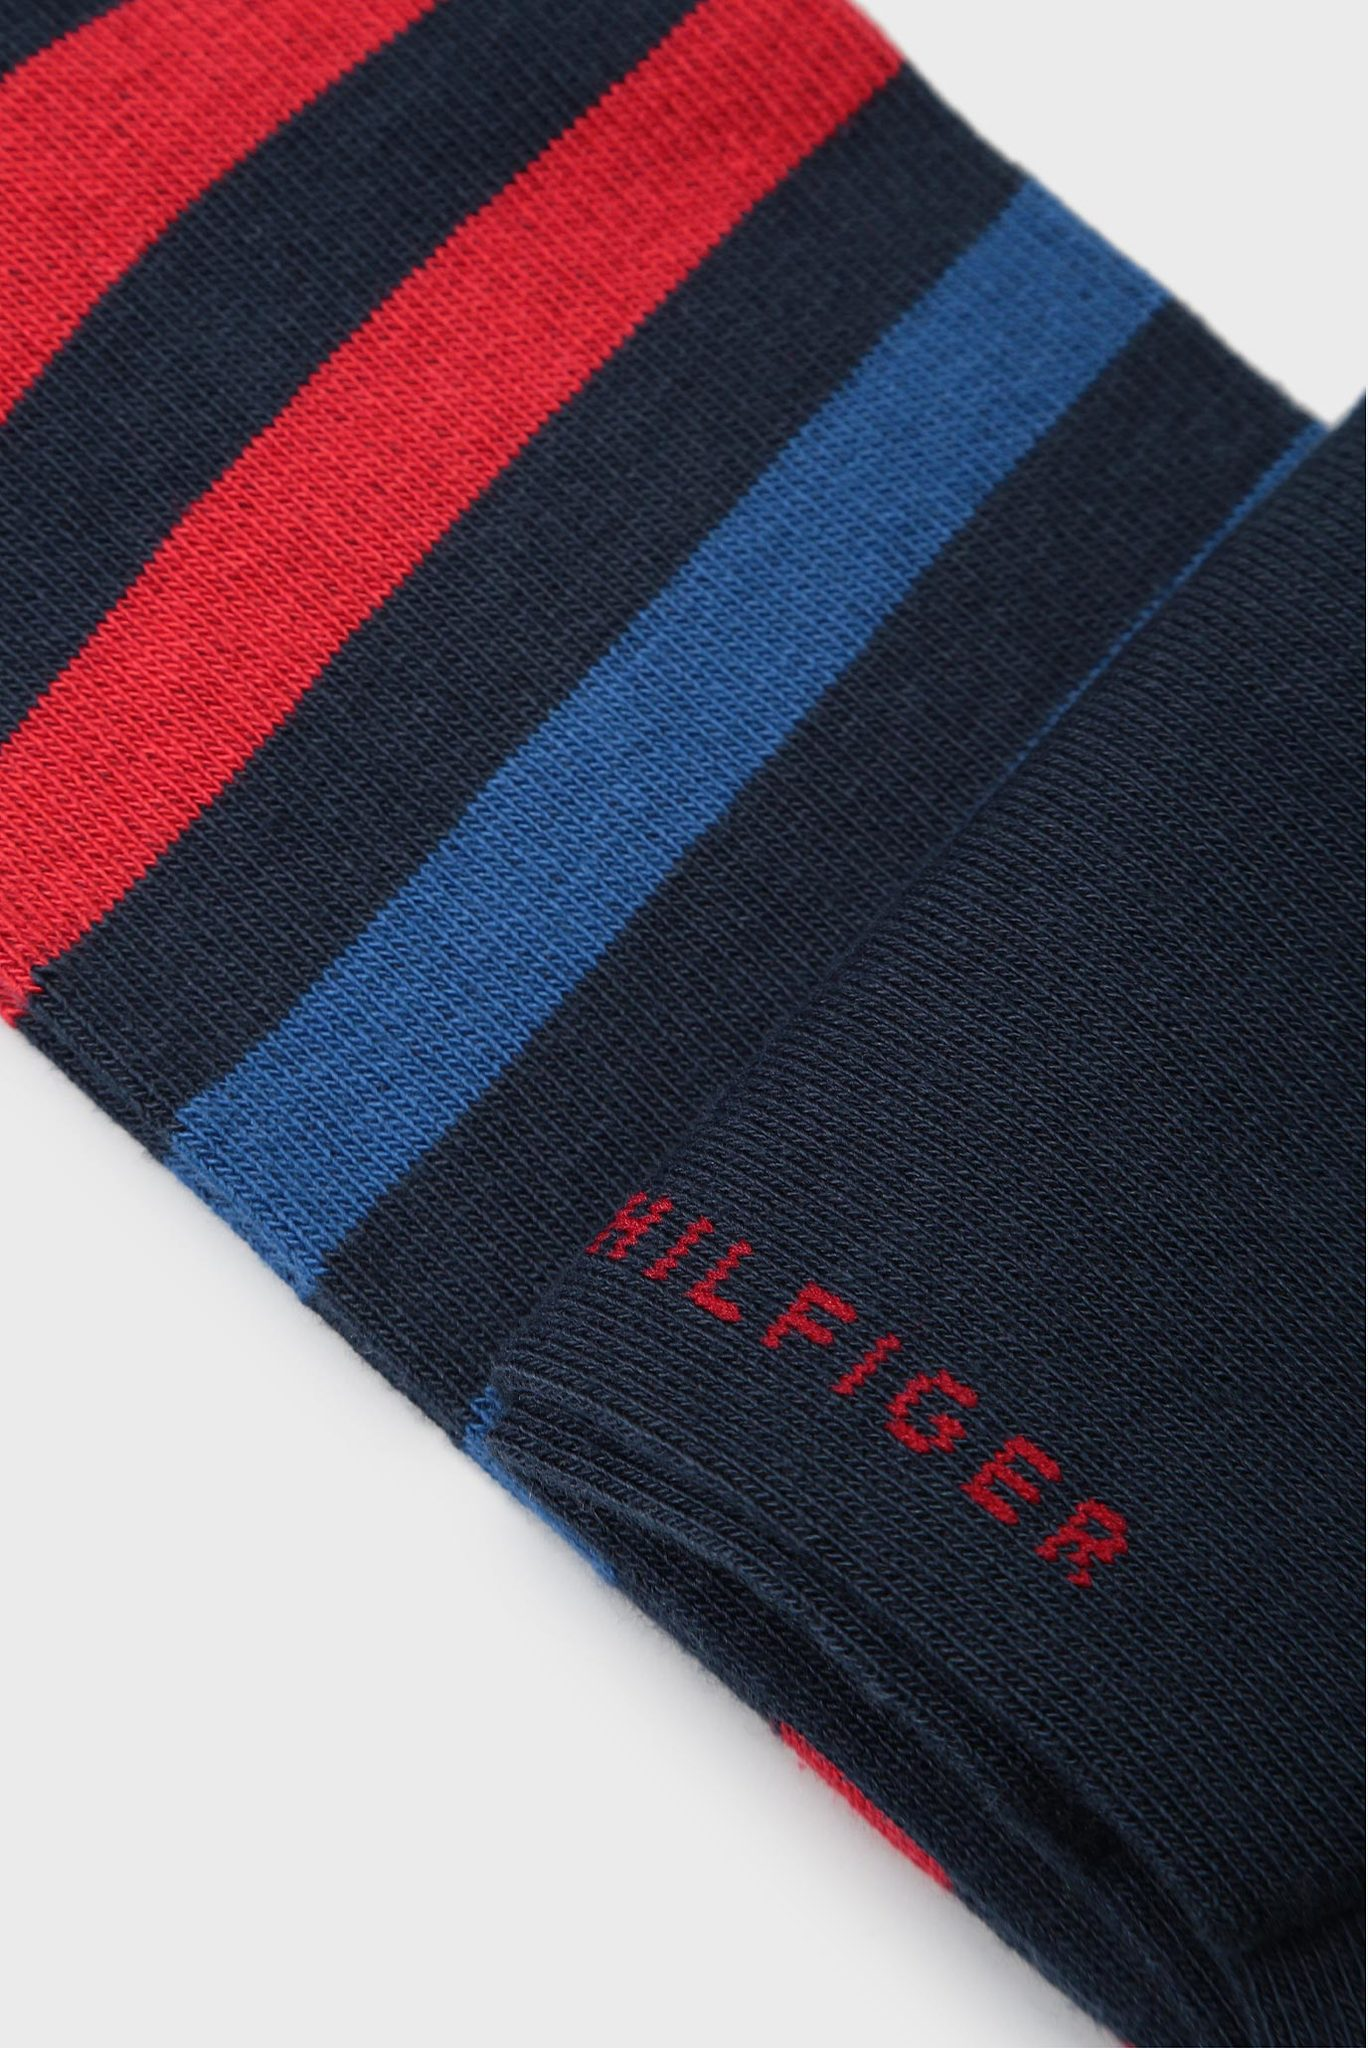 Мужские хлопковые носки (2 пары) Tommy Hilfiger